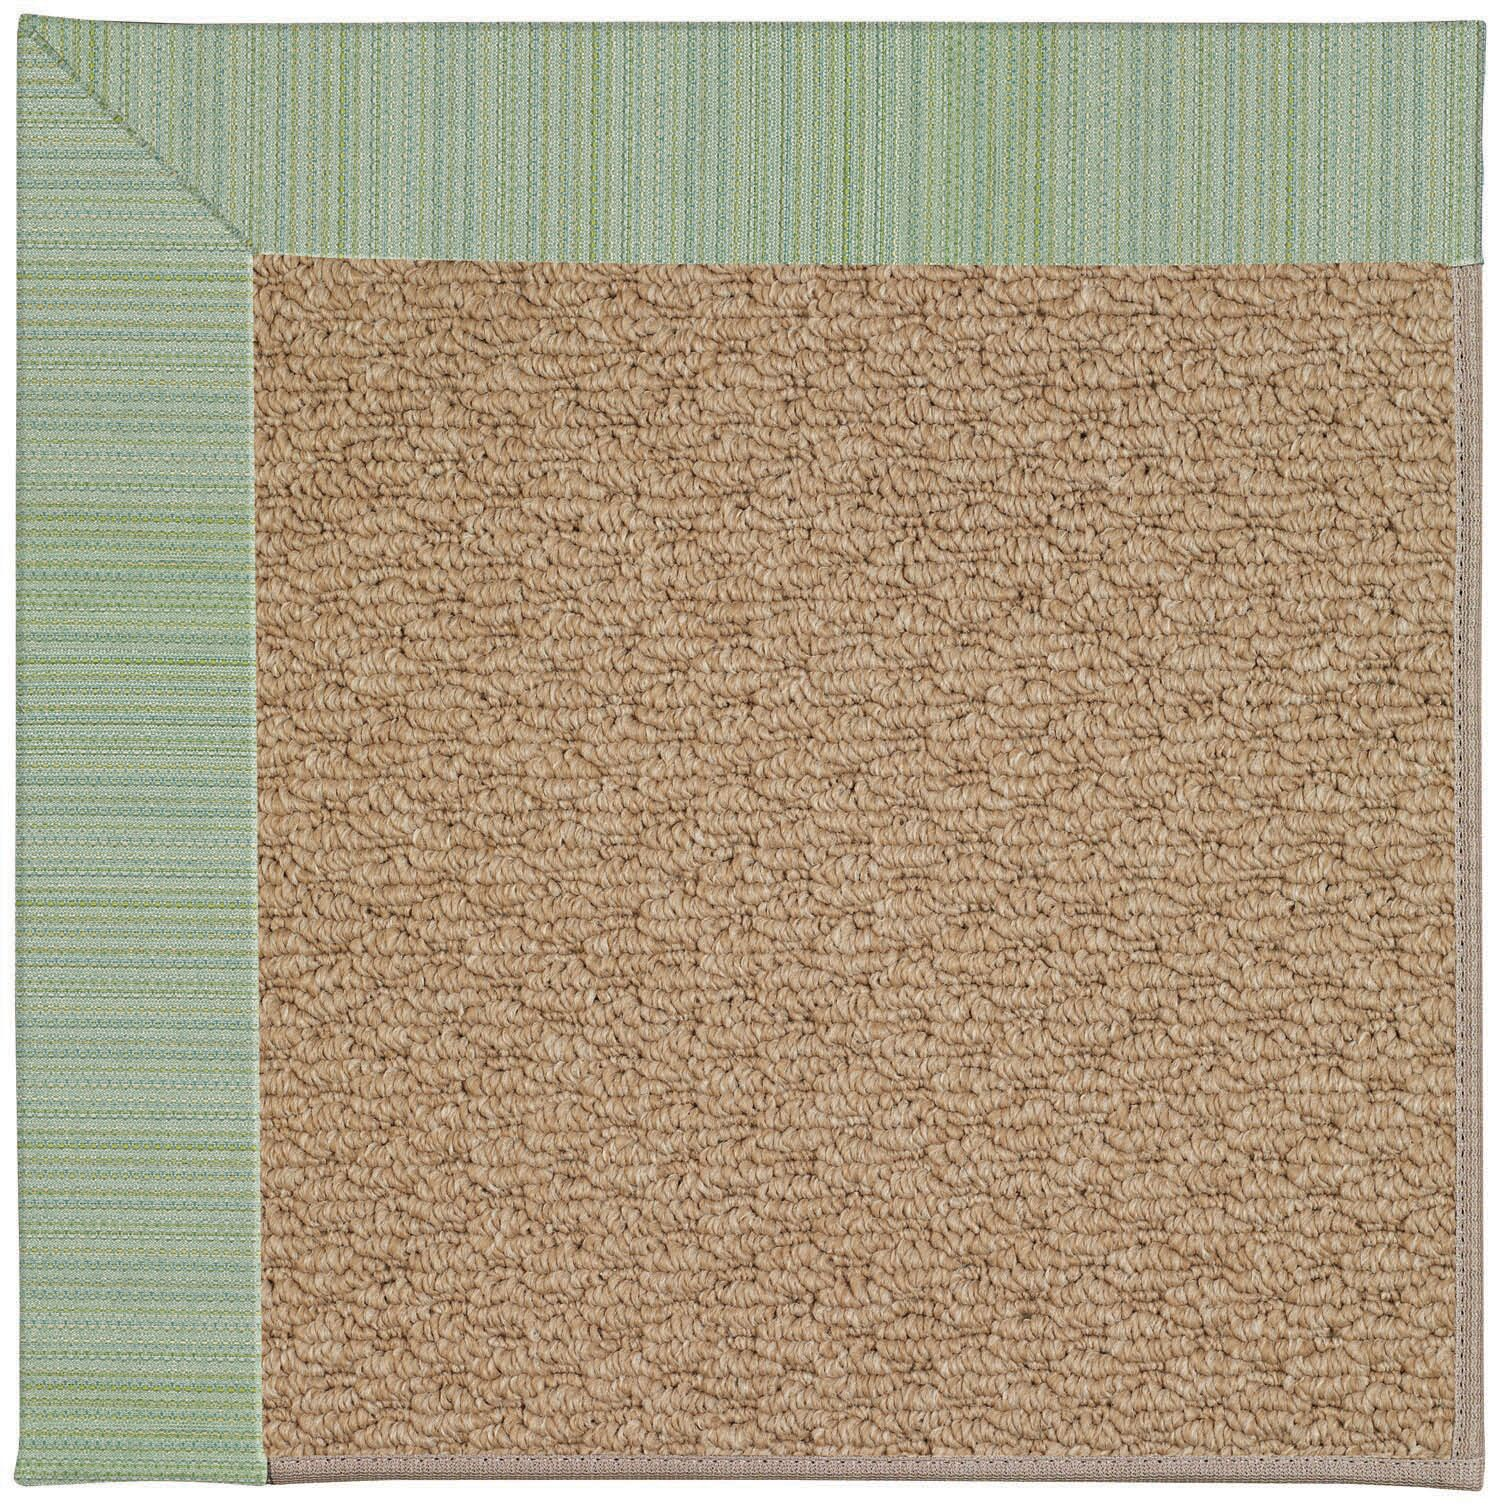 Lisle Machine Woven Green/Brown Indoor/Outdoor Area Rug Rug Size: Rectangle 9' x 12'